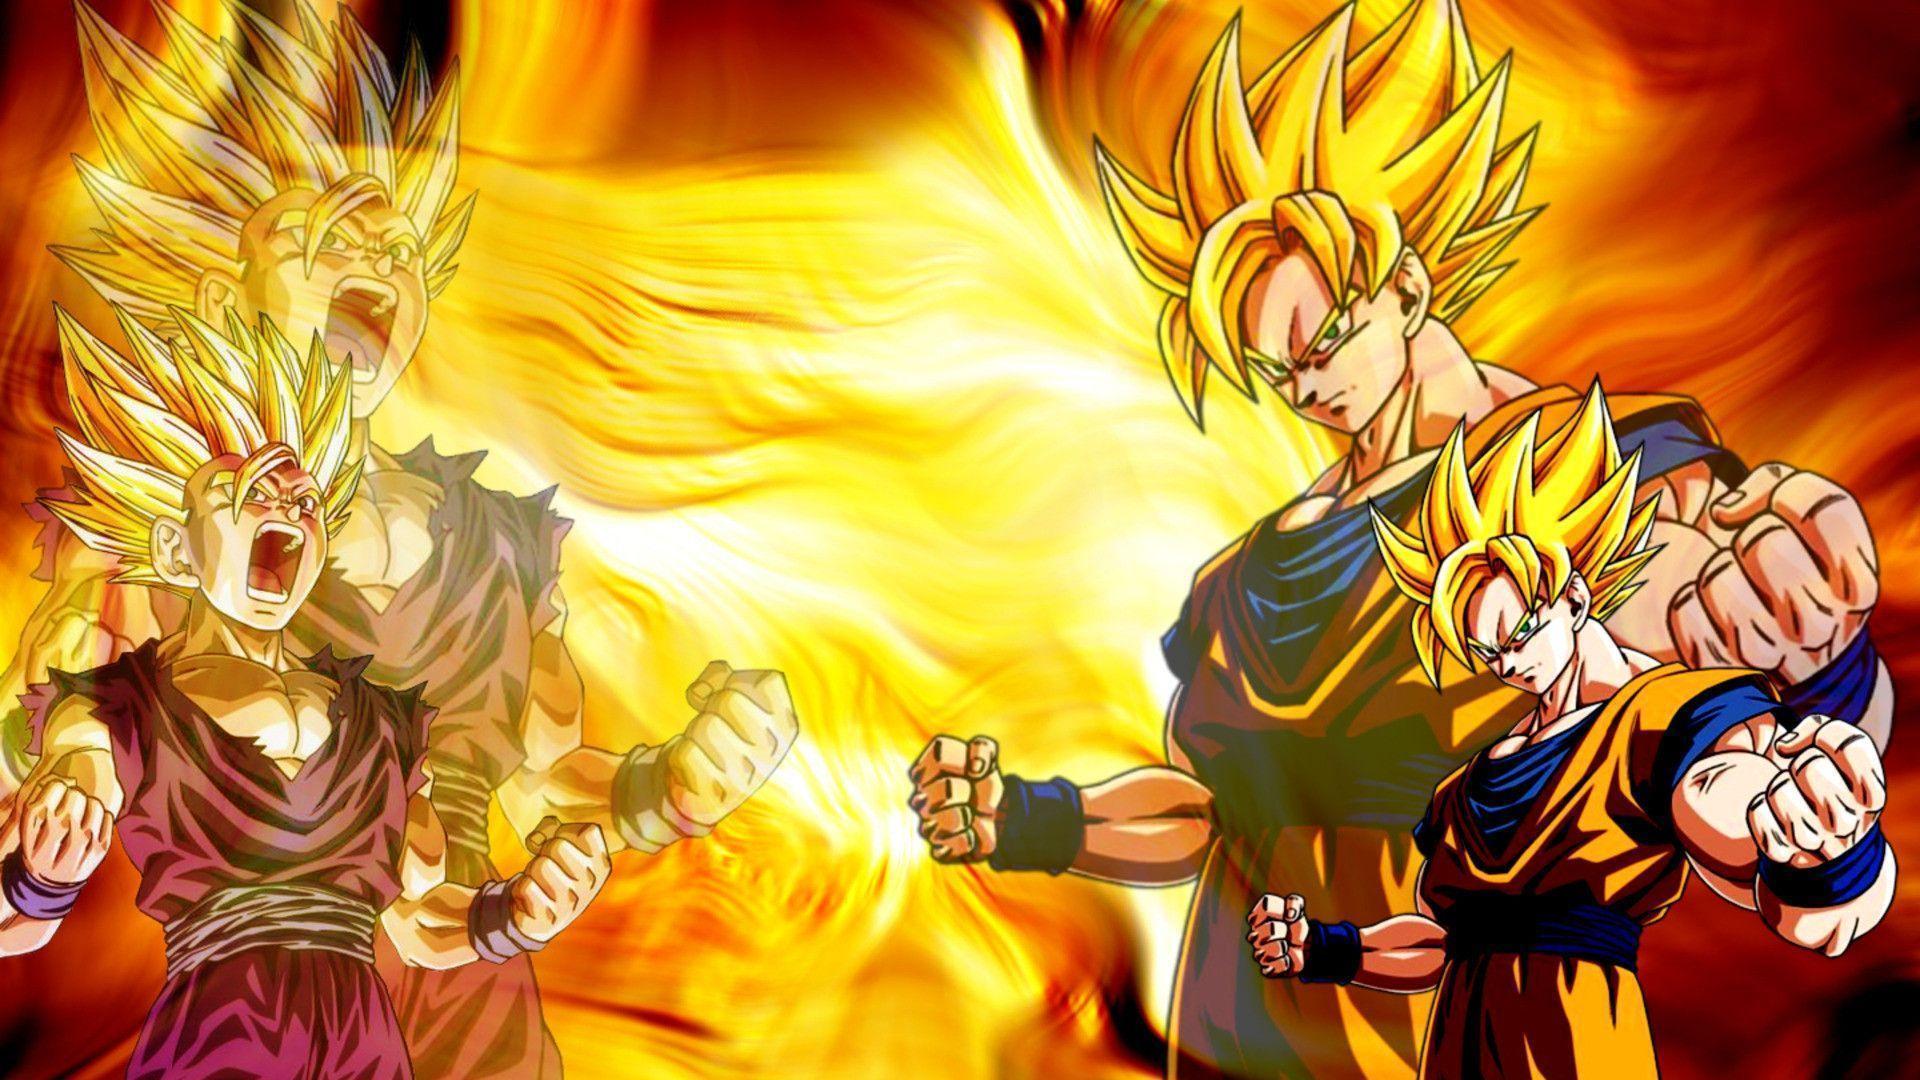 son goku wallpaper  Son Goku Wallpapers - Wallpaper Cave